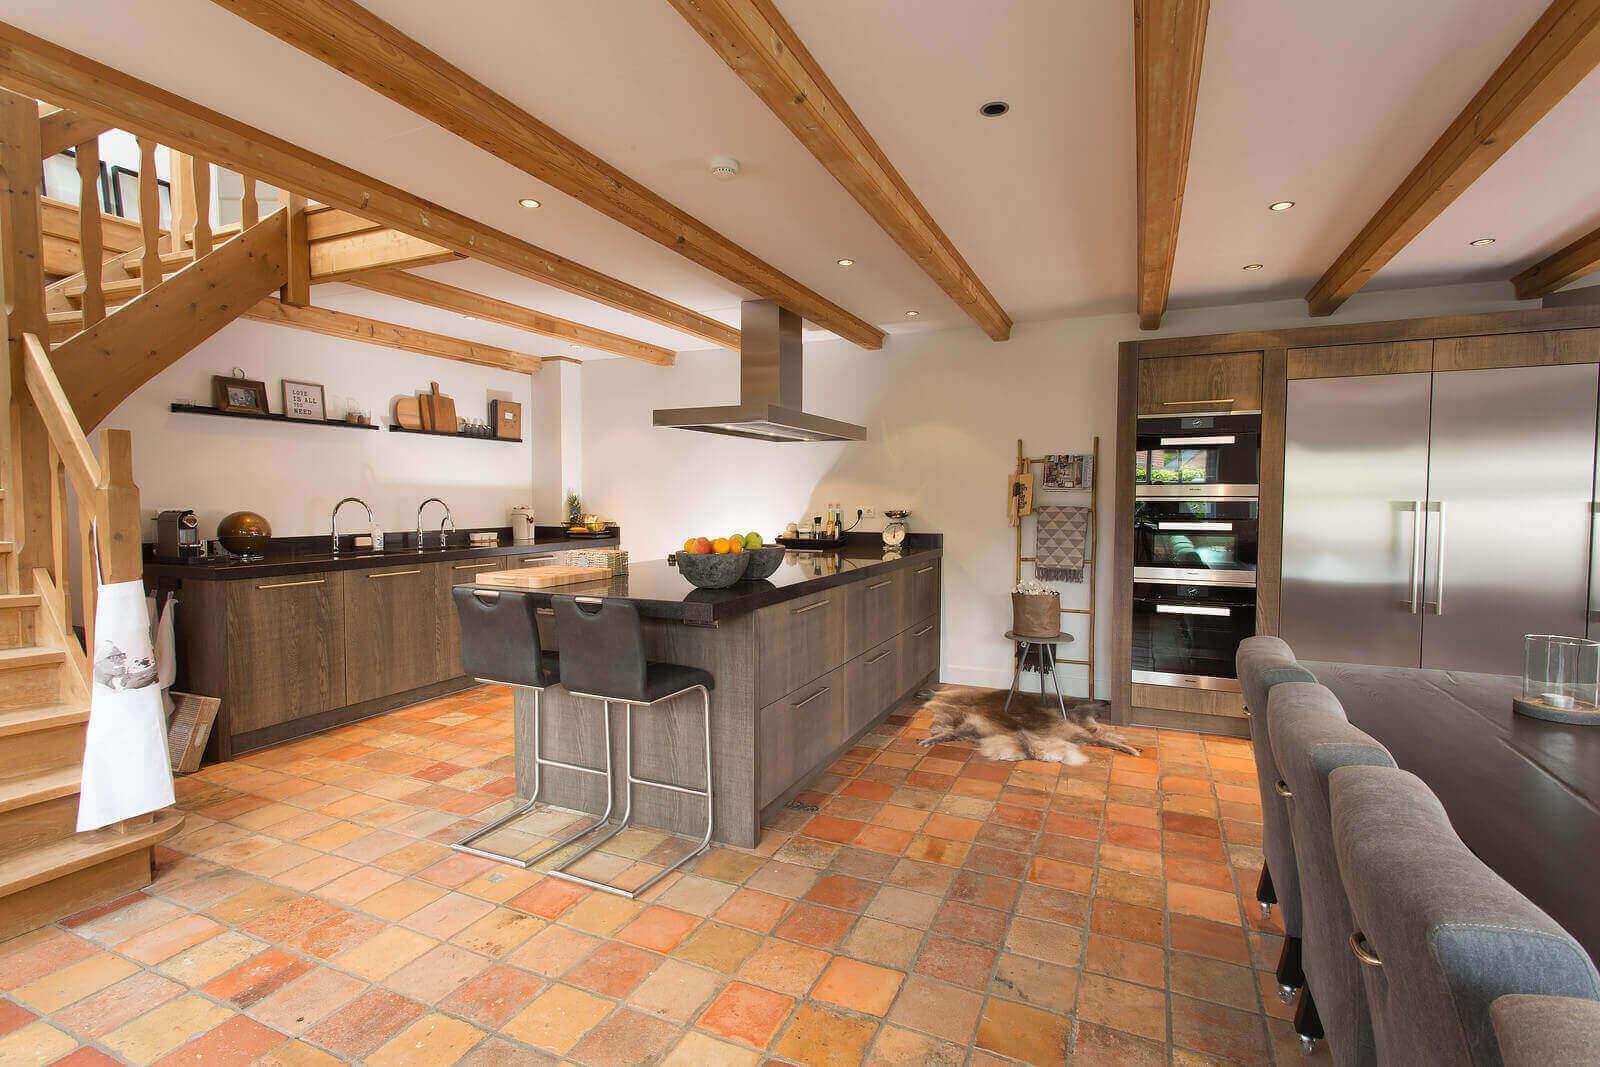 Donkere houtlook keuken